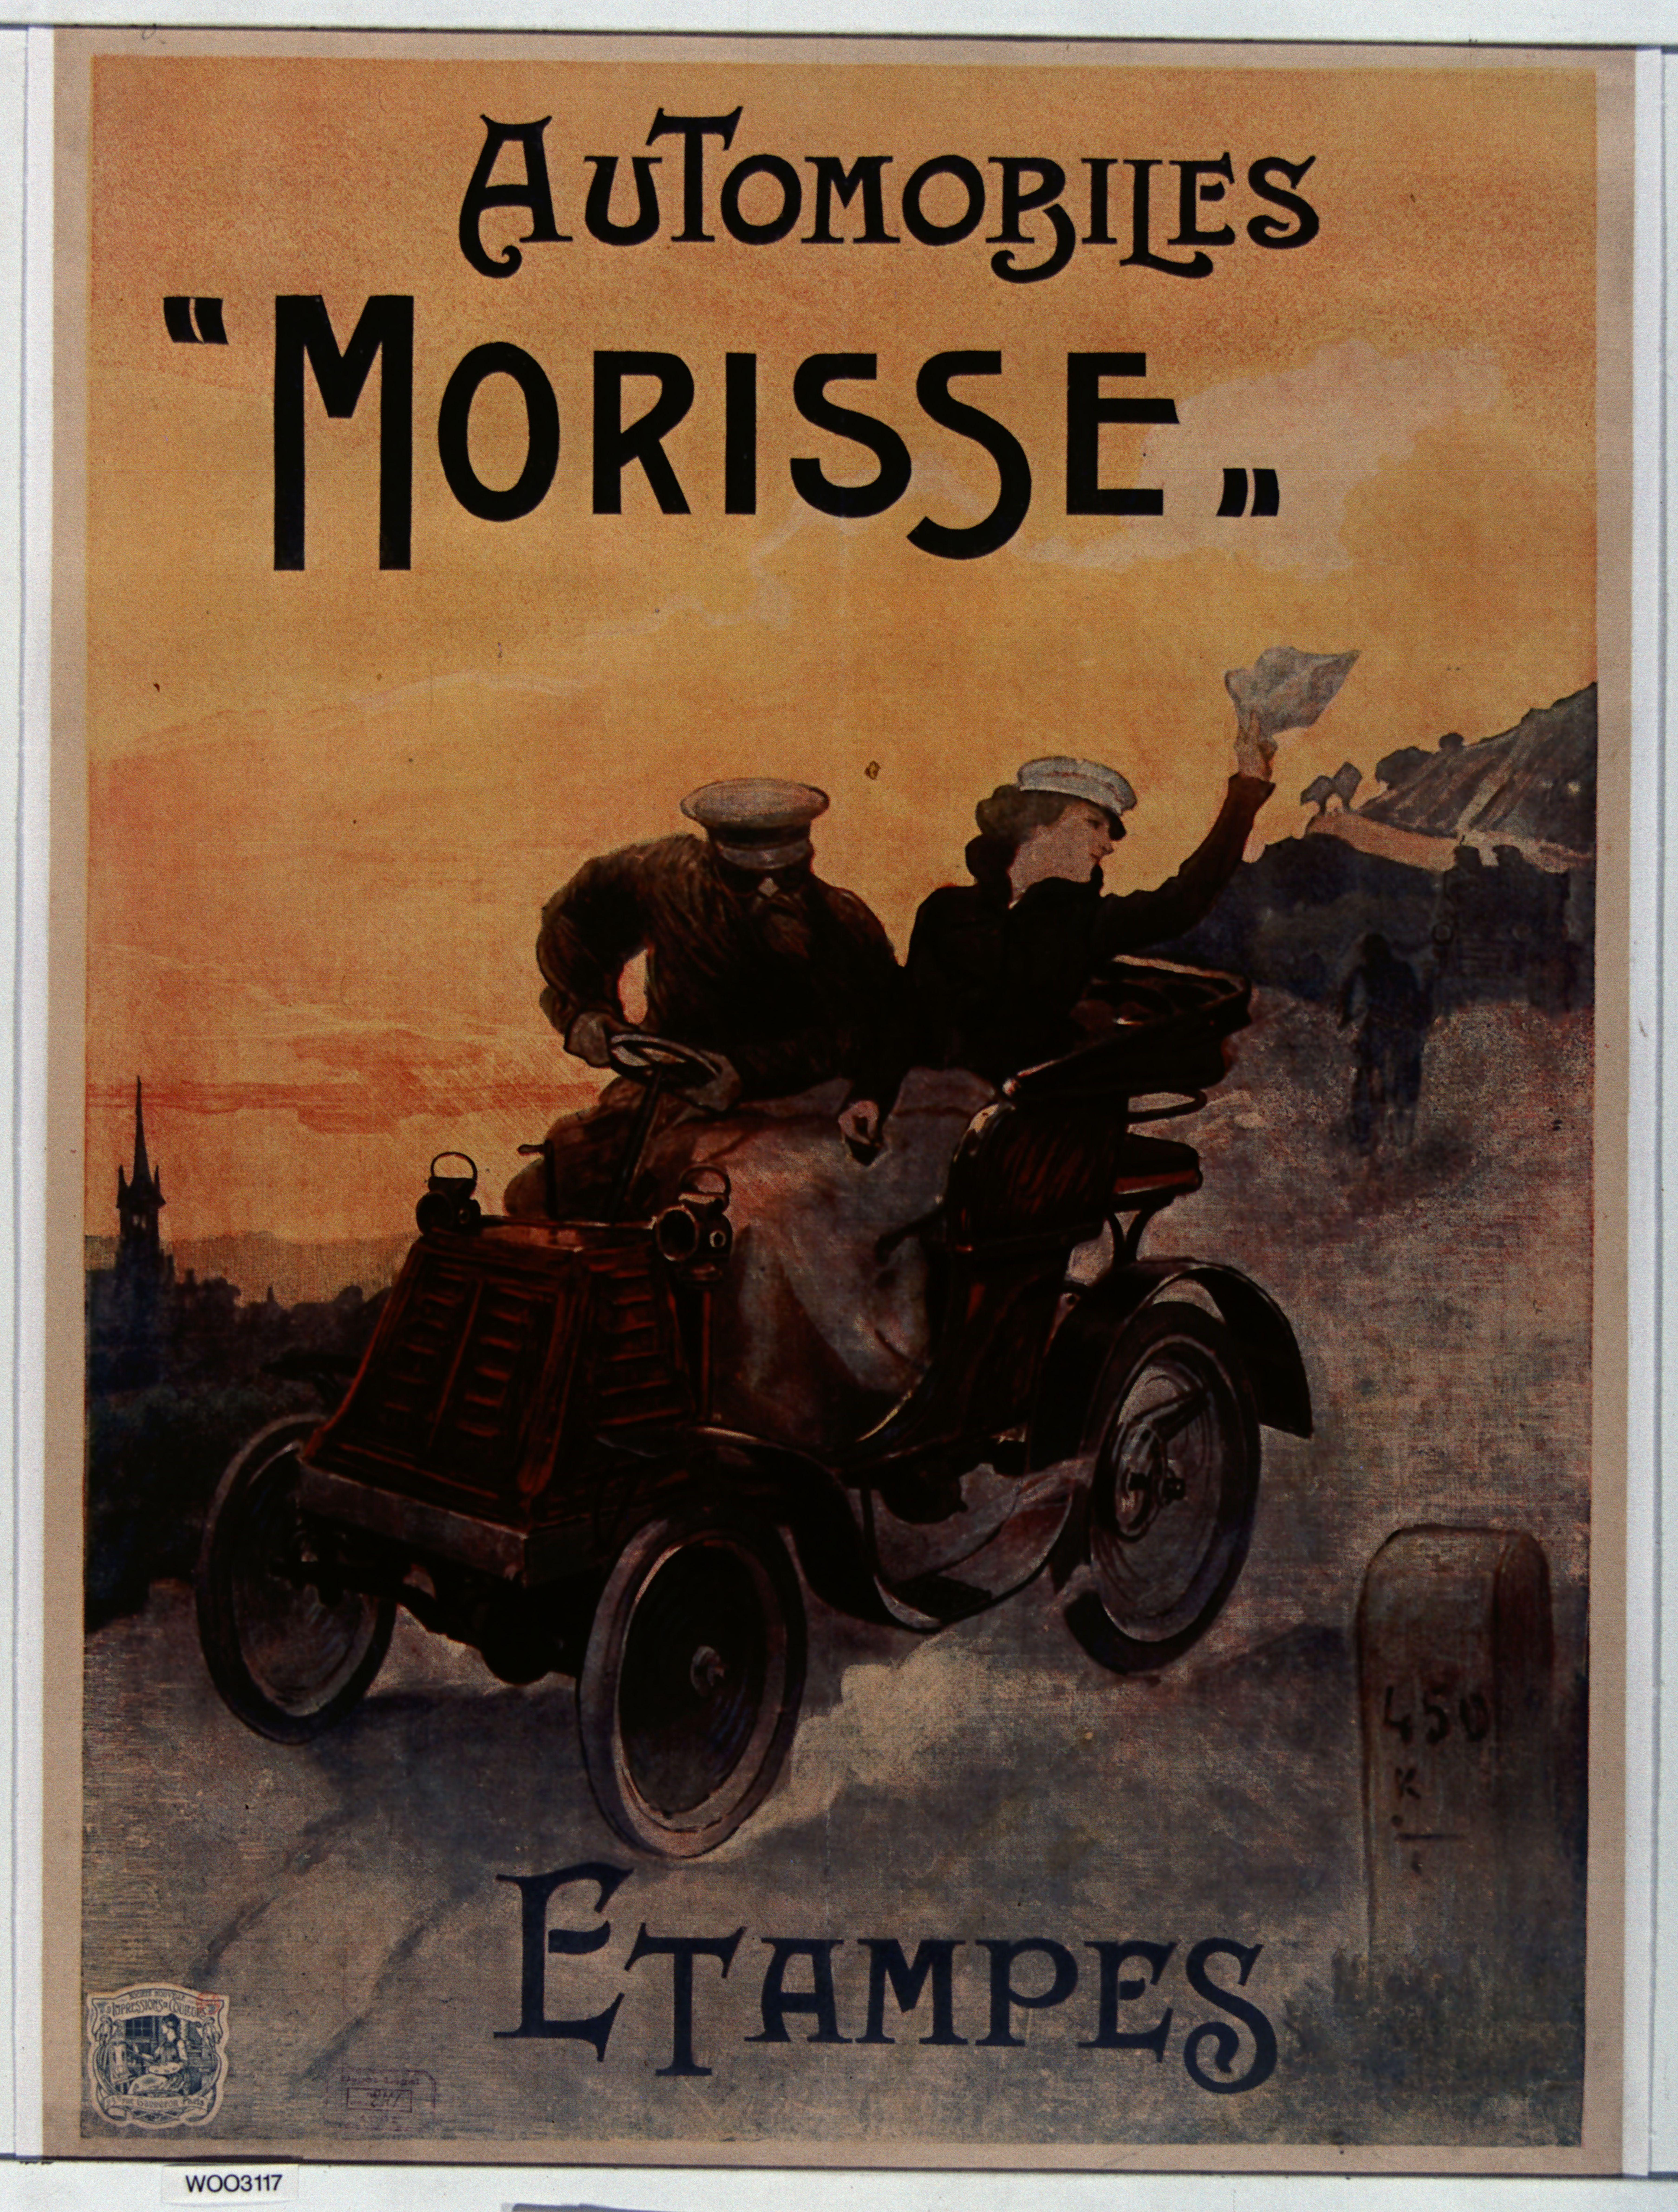 Automobiles Morisse.jpg